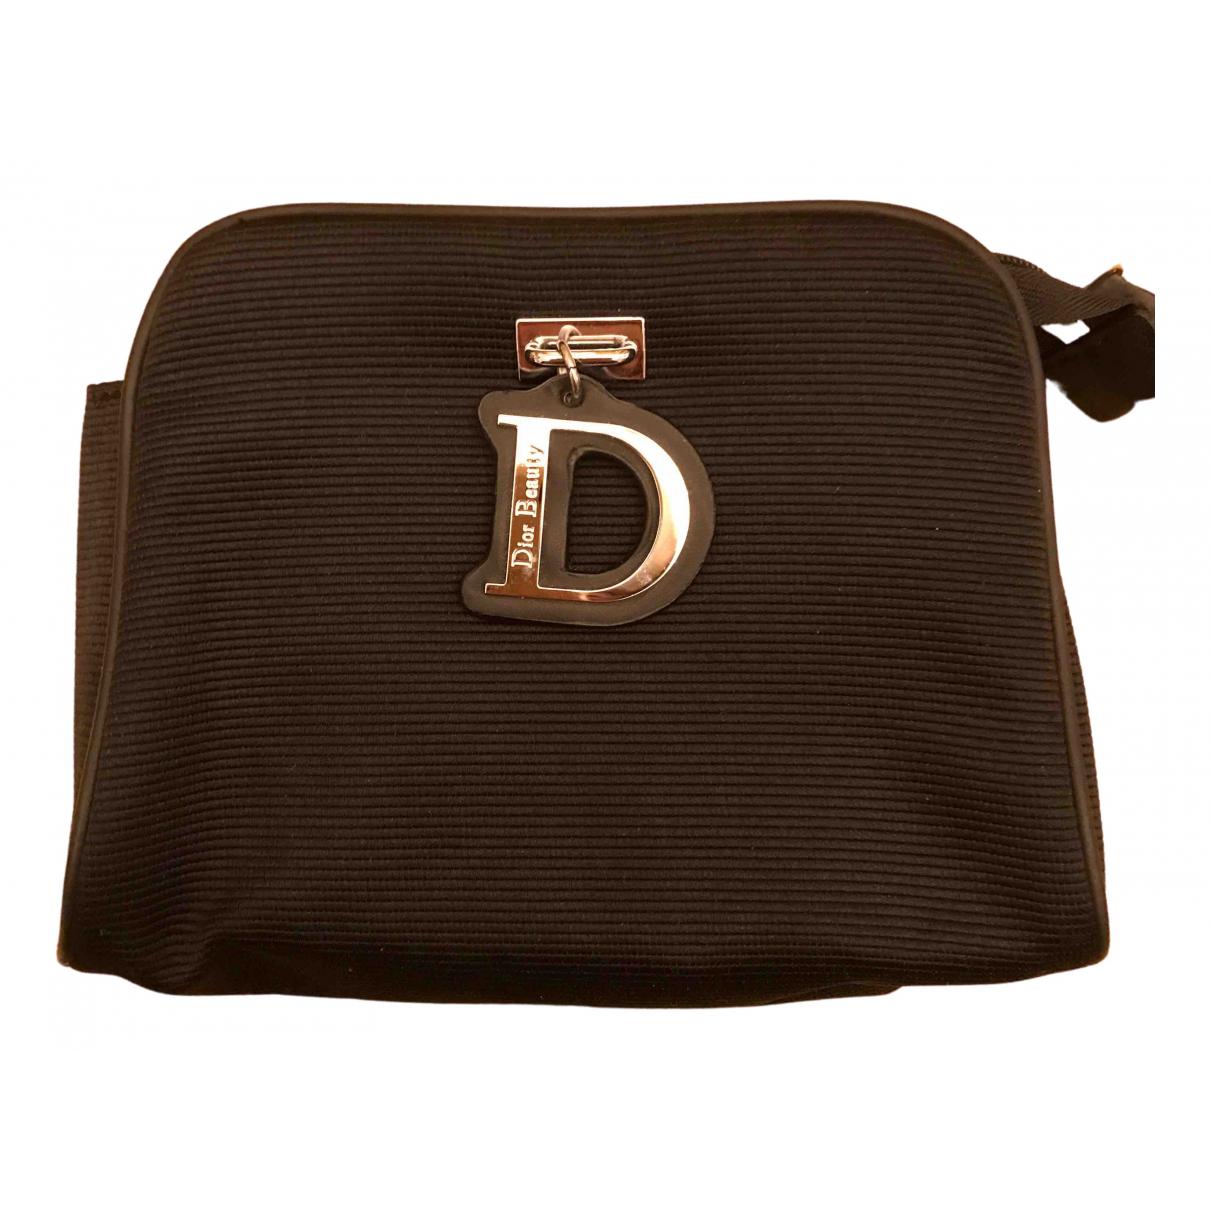 Dior N Black Cloth Travel bag for Women N